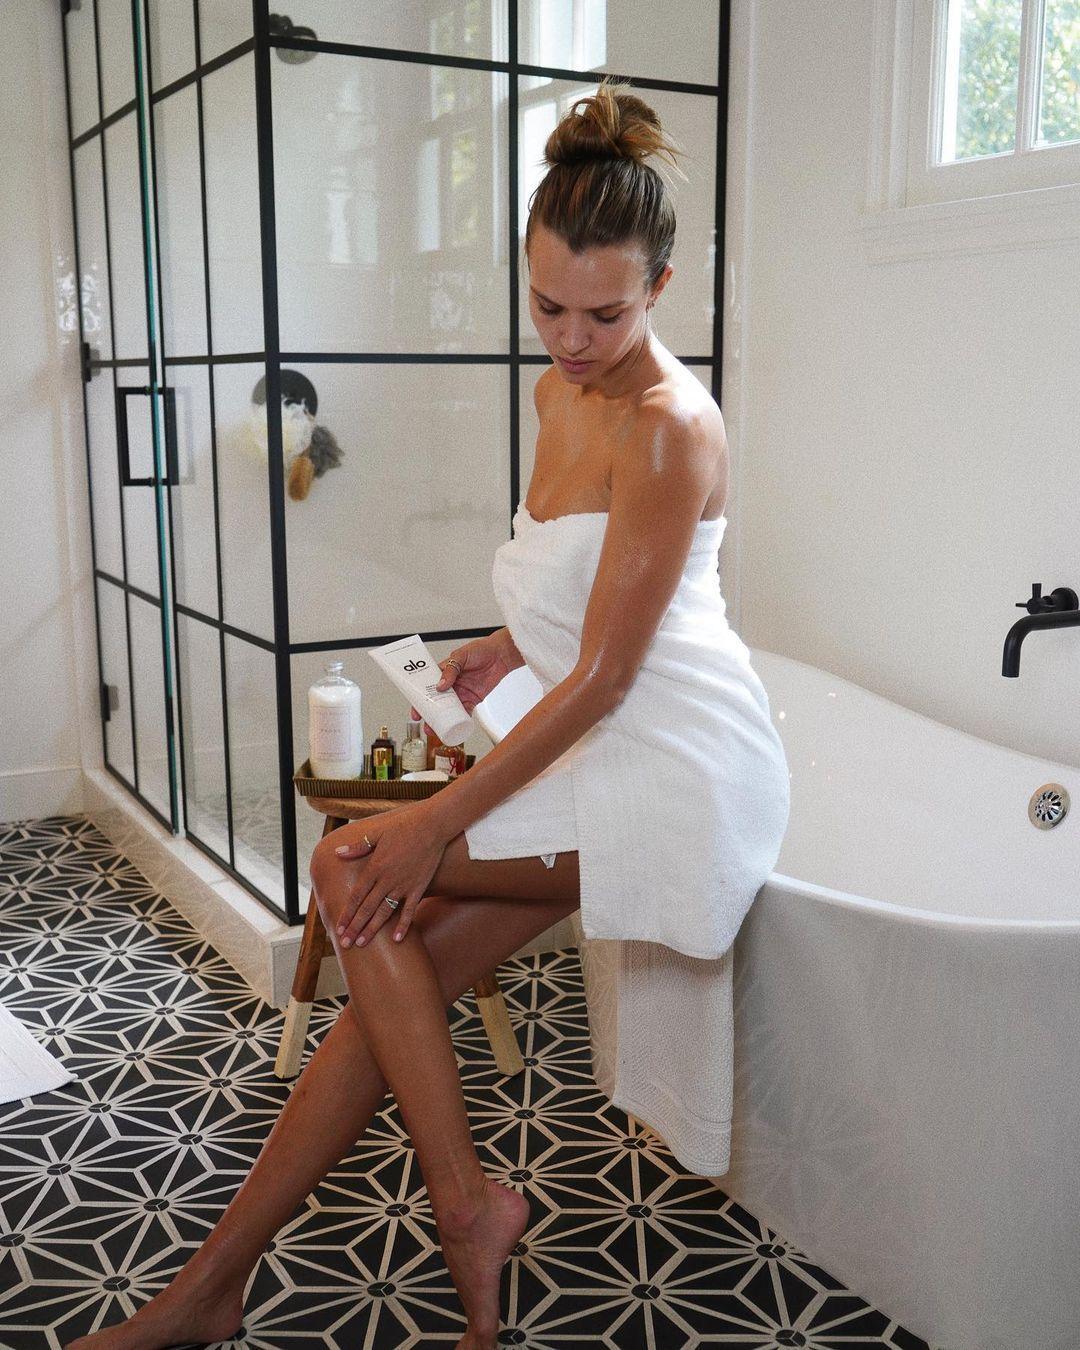 Josephine Skriver In Towel